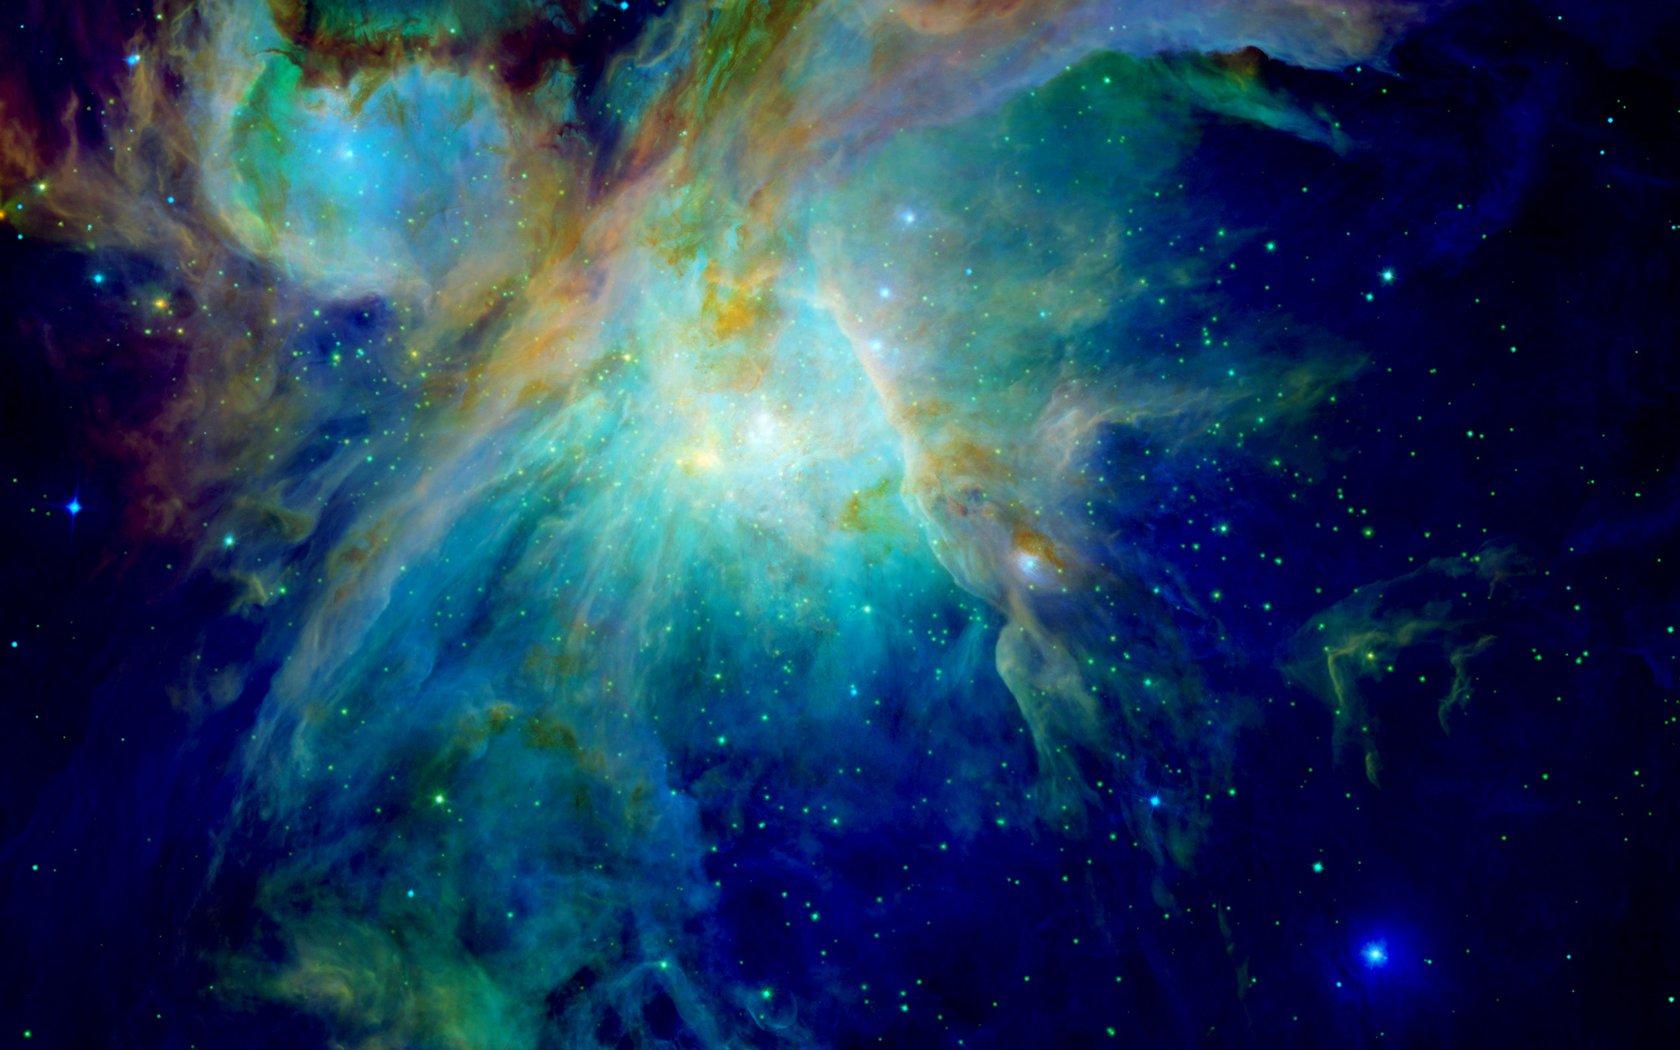 Orion Nebula Wallpaper HD - WallpaperSafari Blue Nebula Wallpaper Widescreen